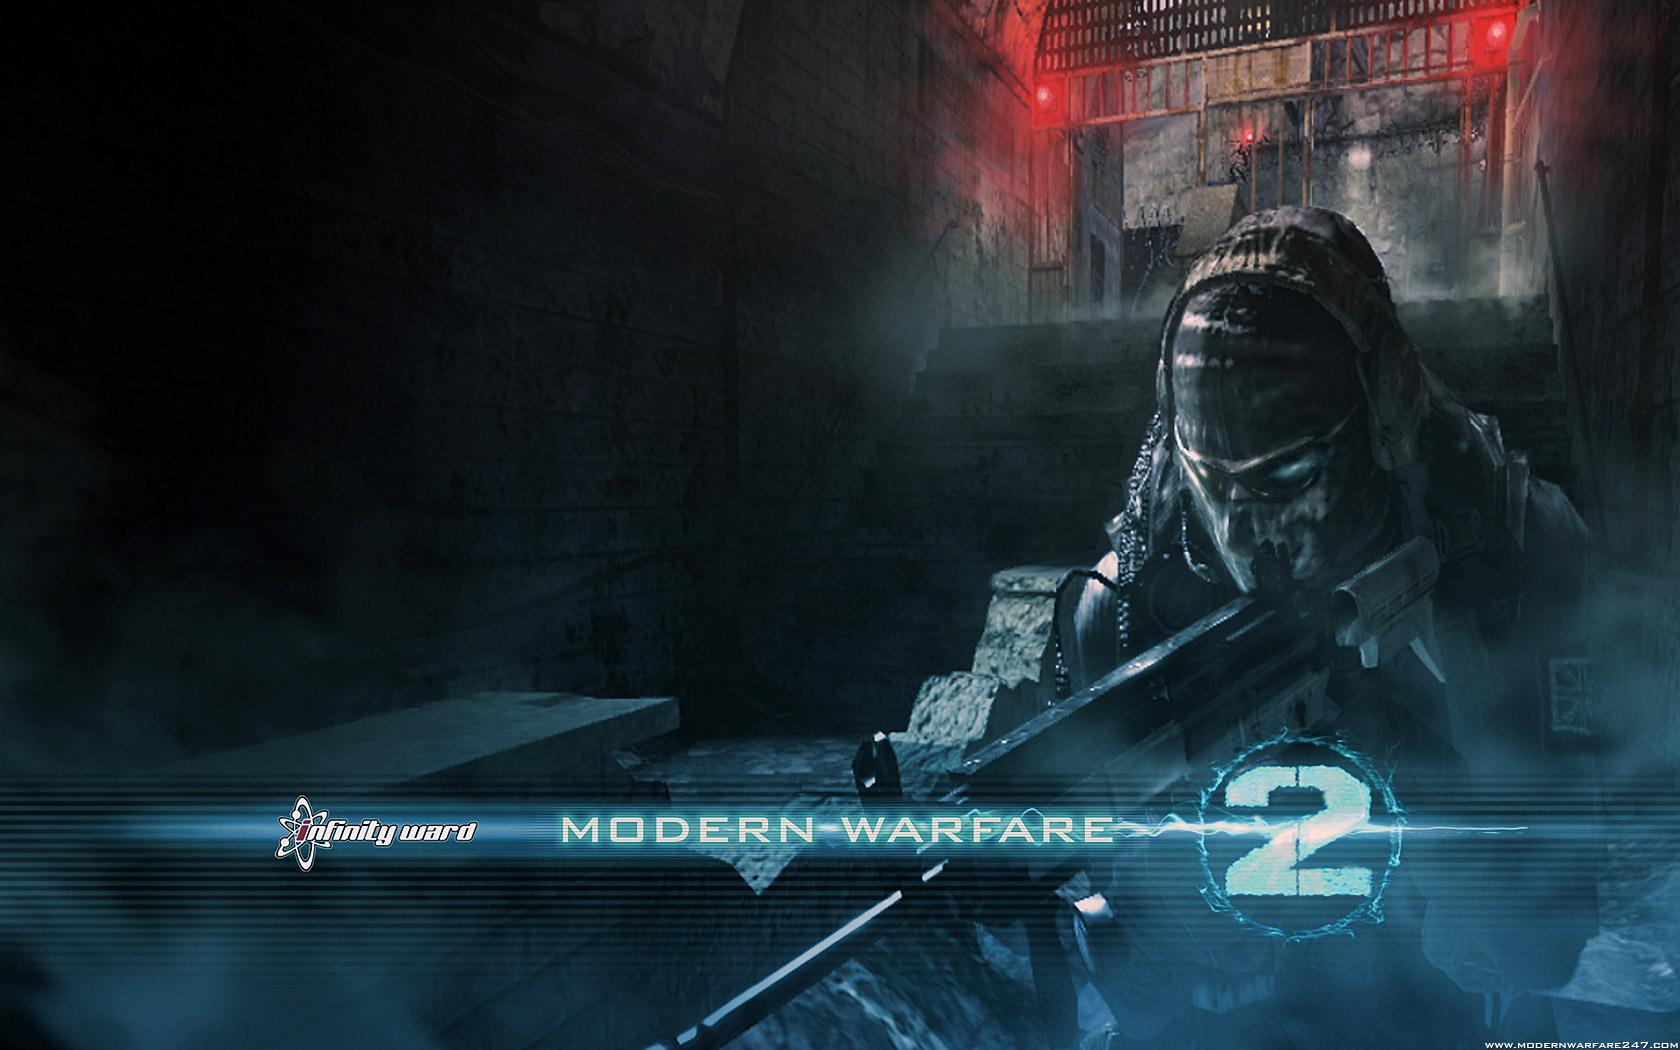 Free HQ Modern Warfare 2 Ghost Call Of Duty Series Wallpaper - Free HQ ...